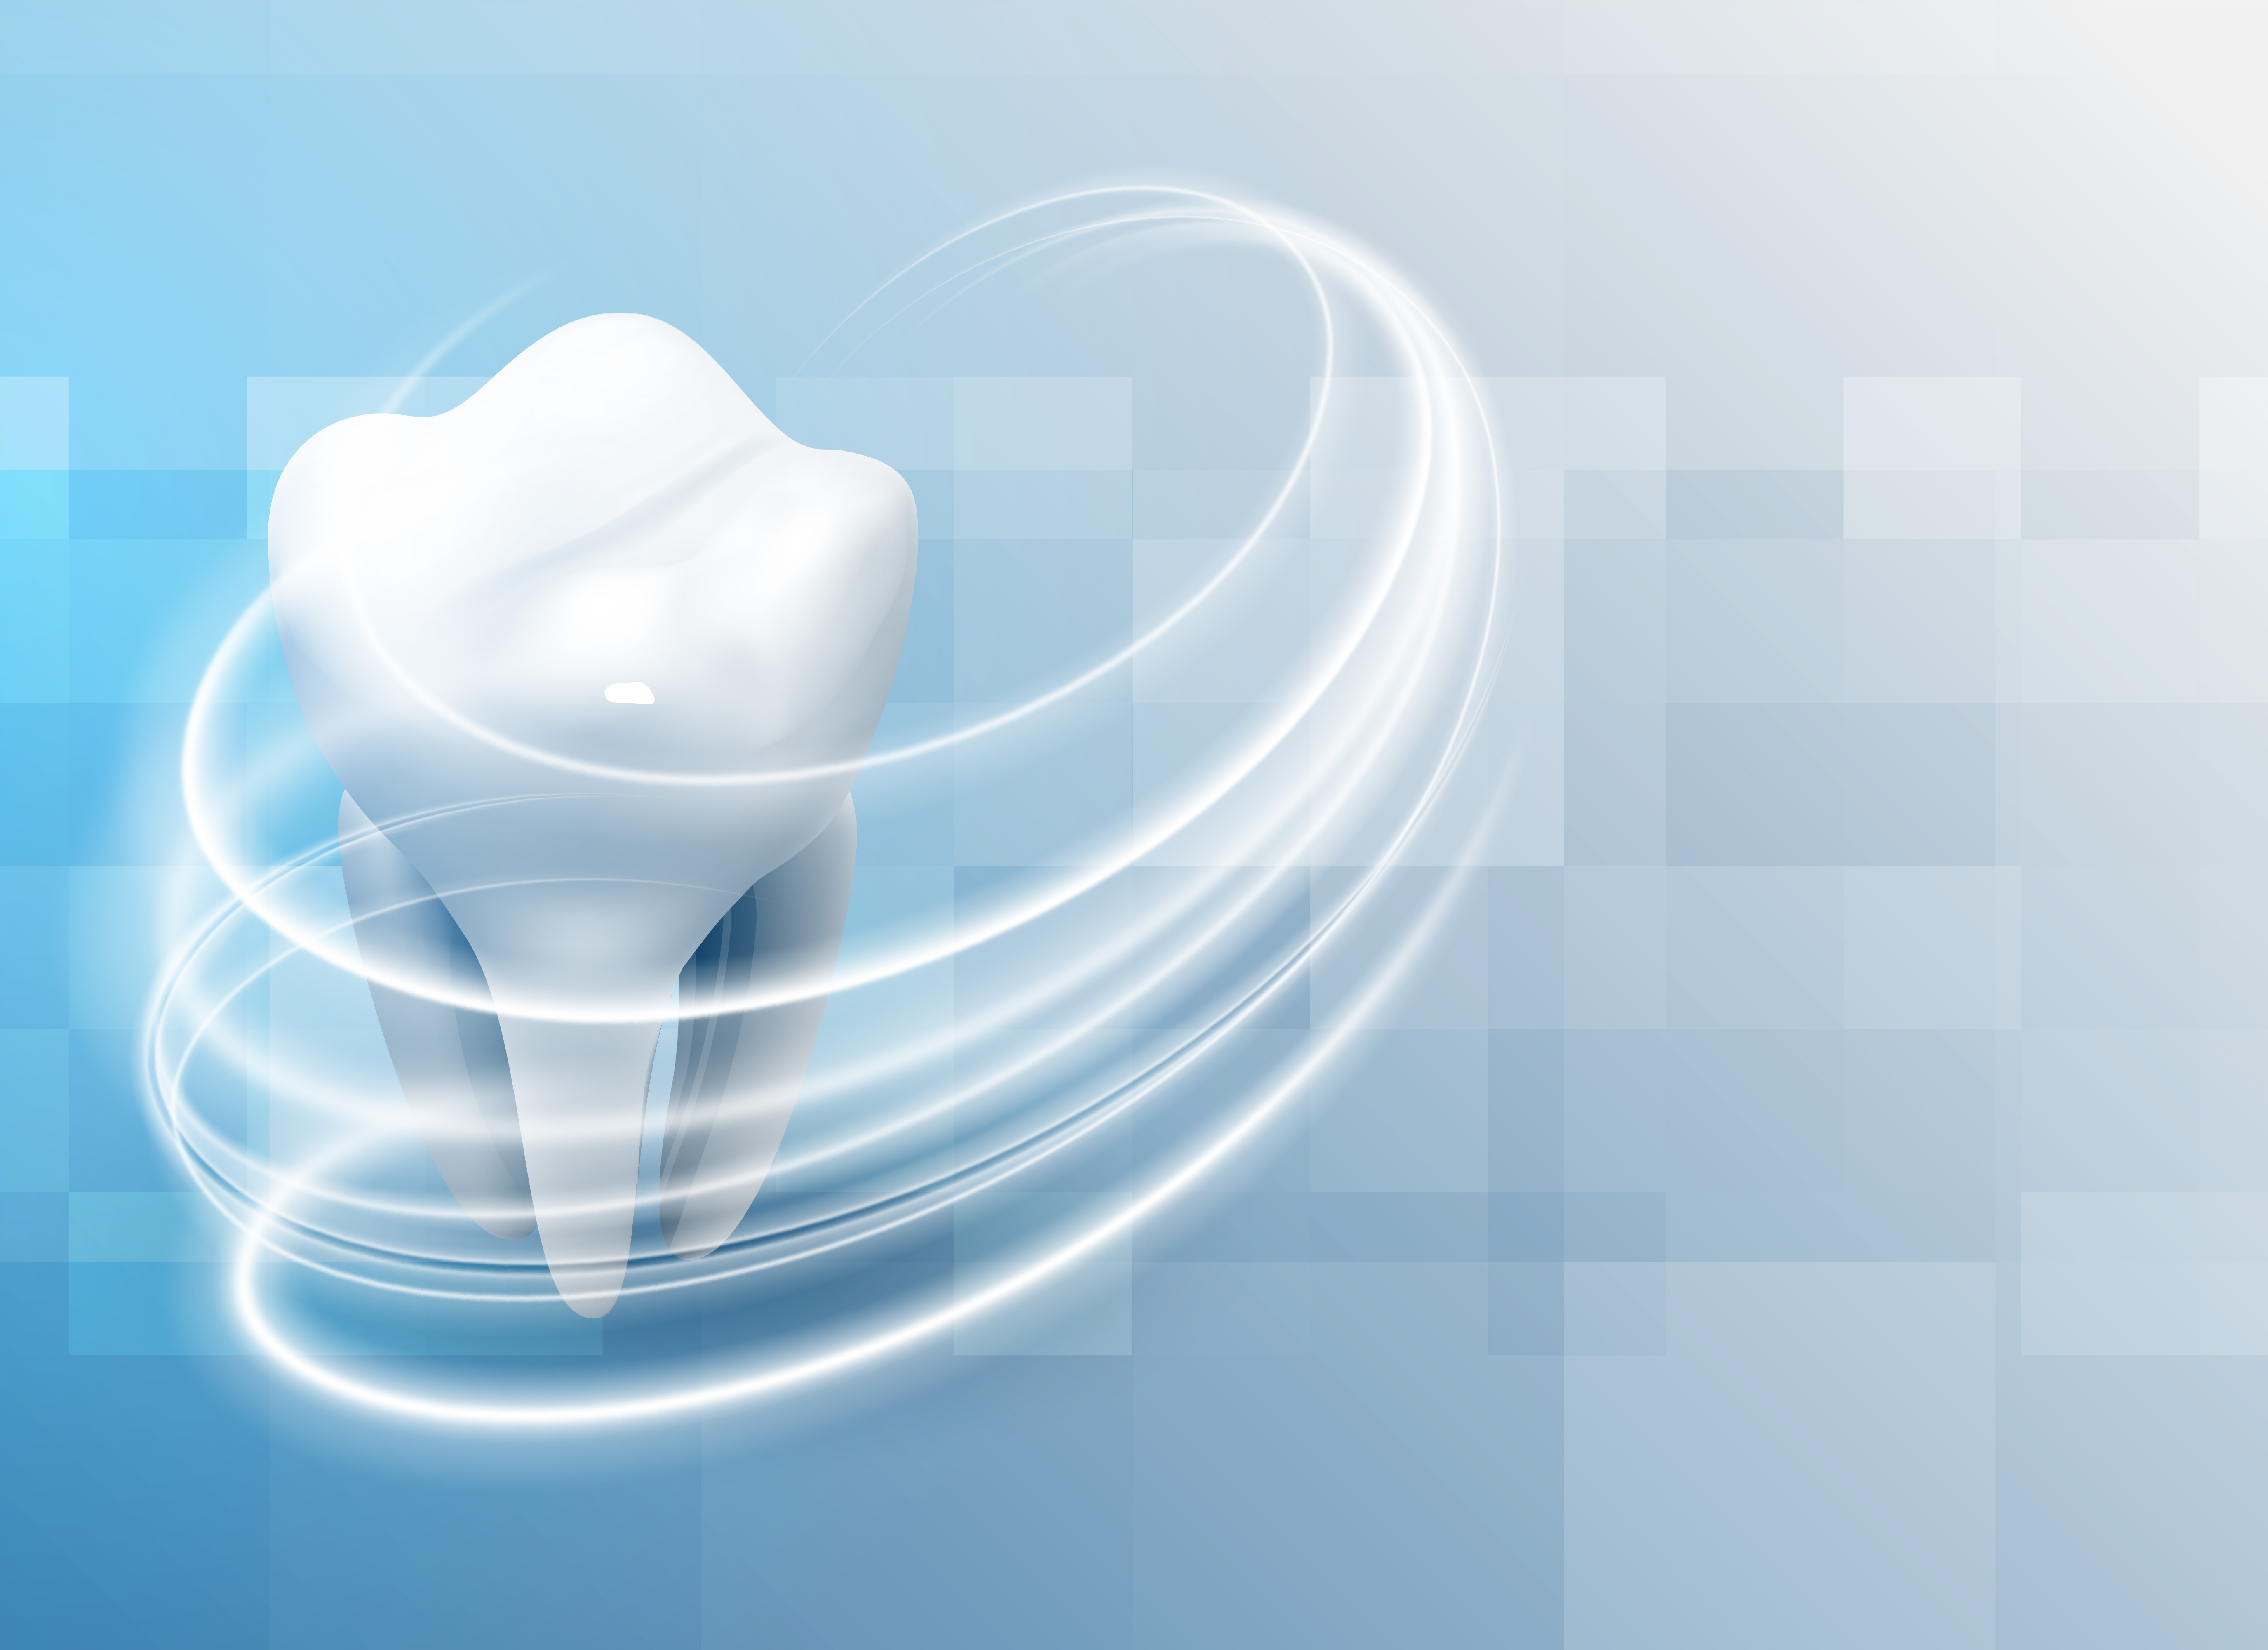 teeth dental care medical background